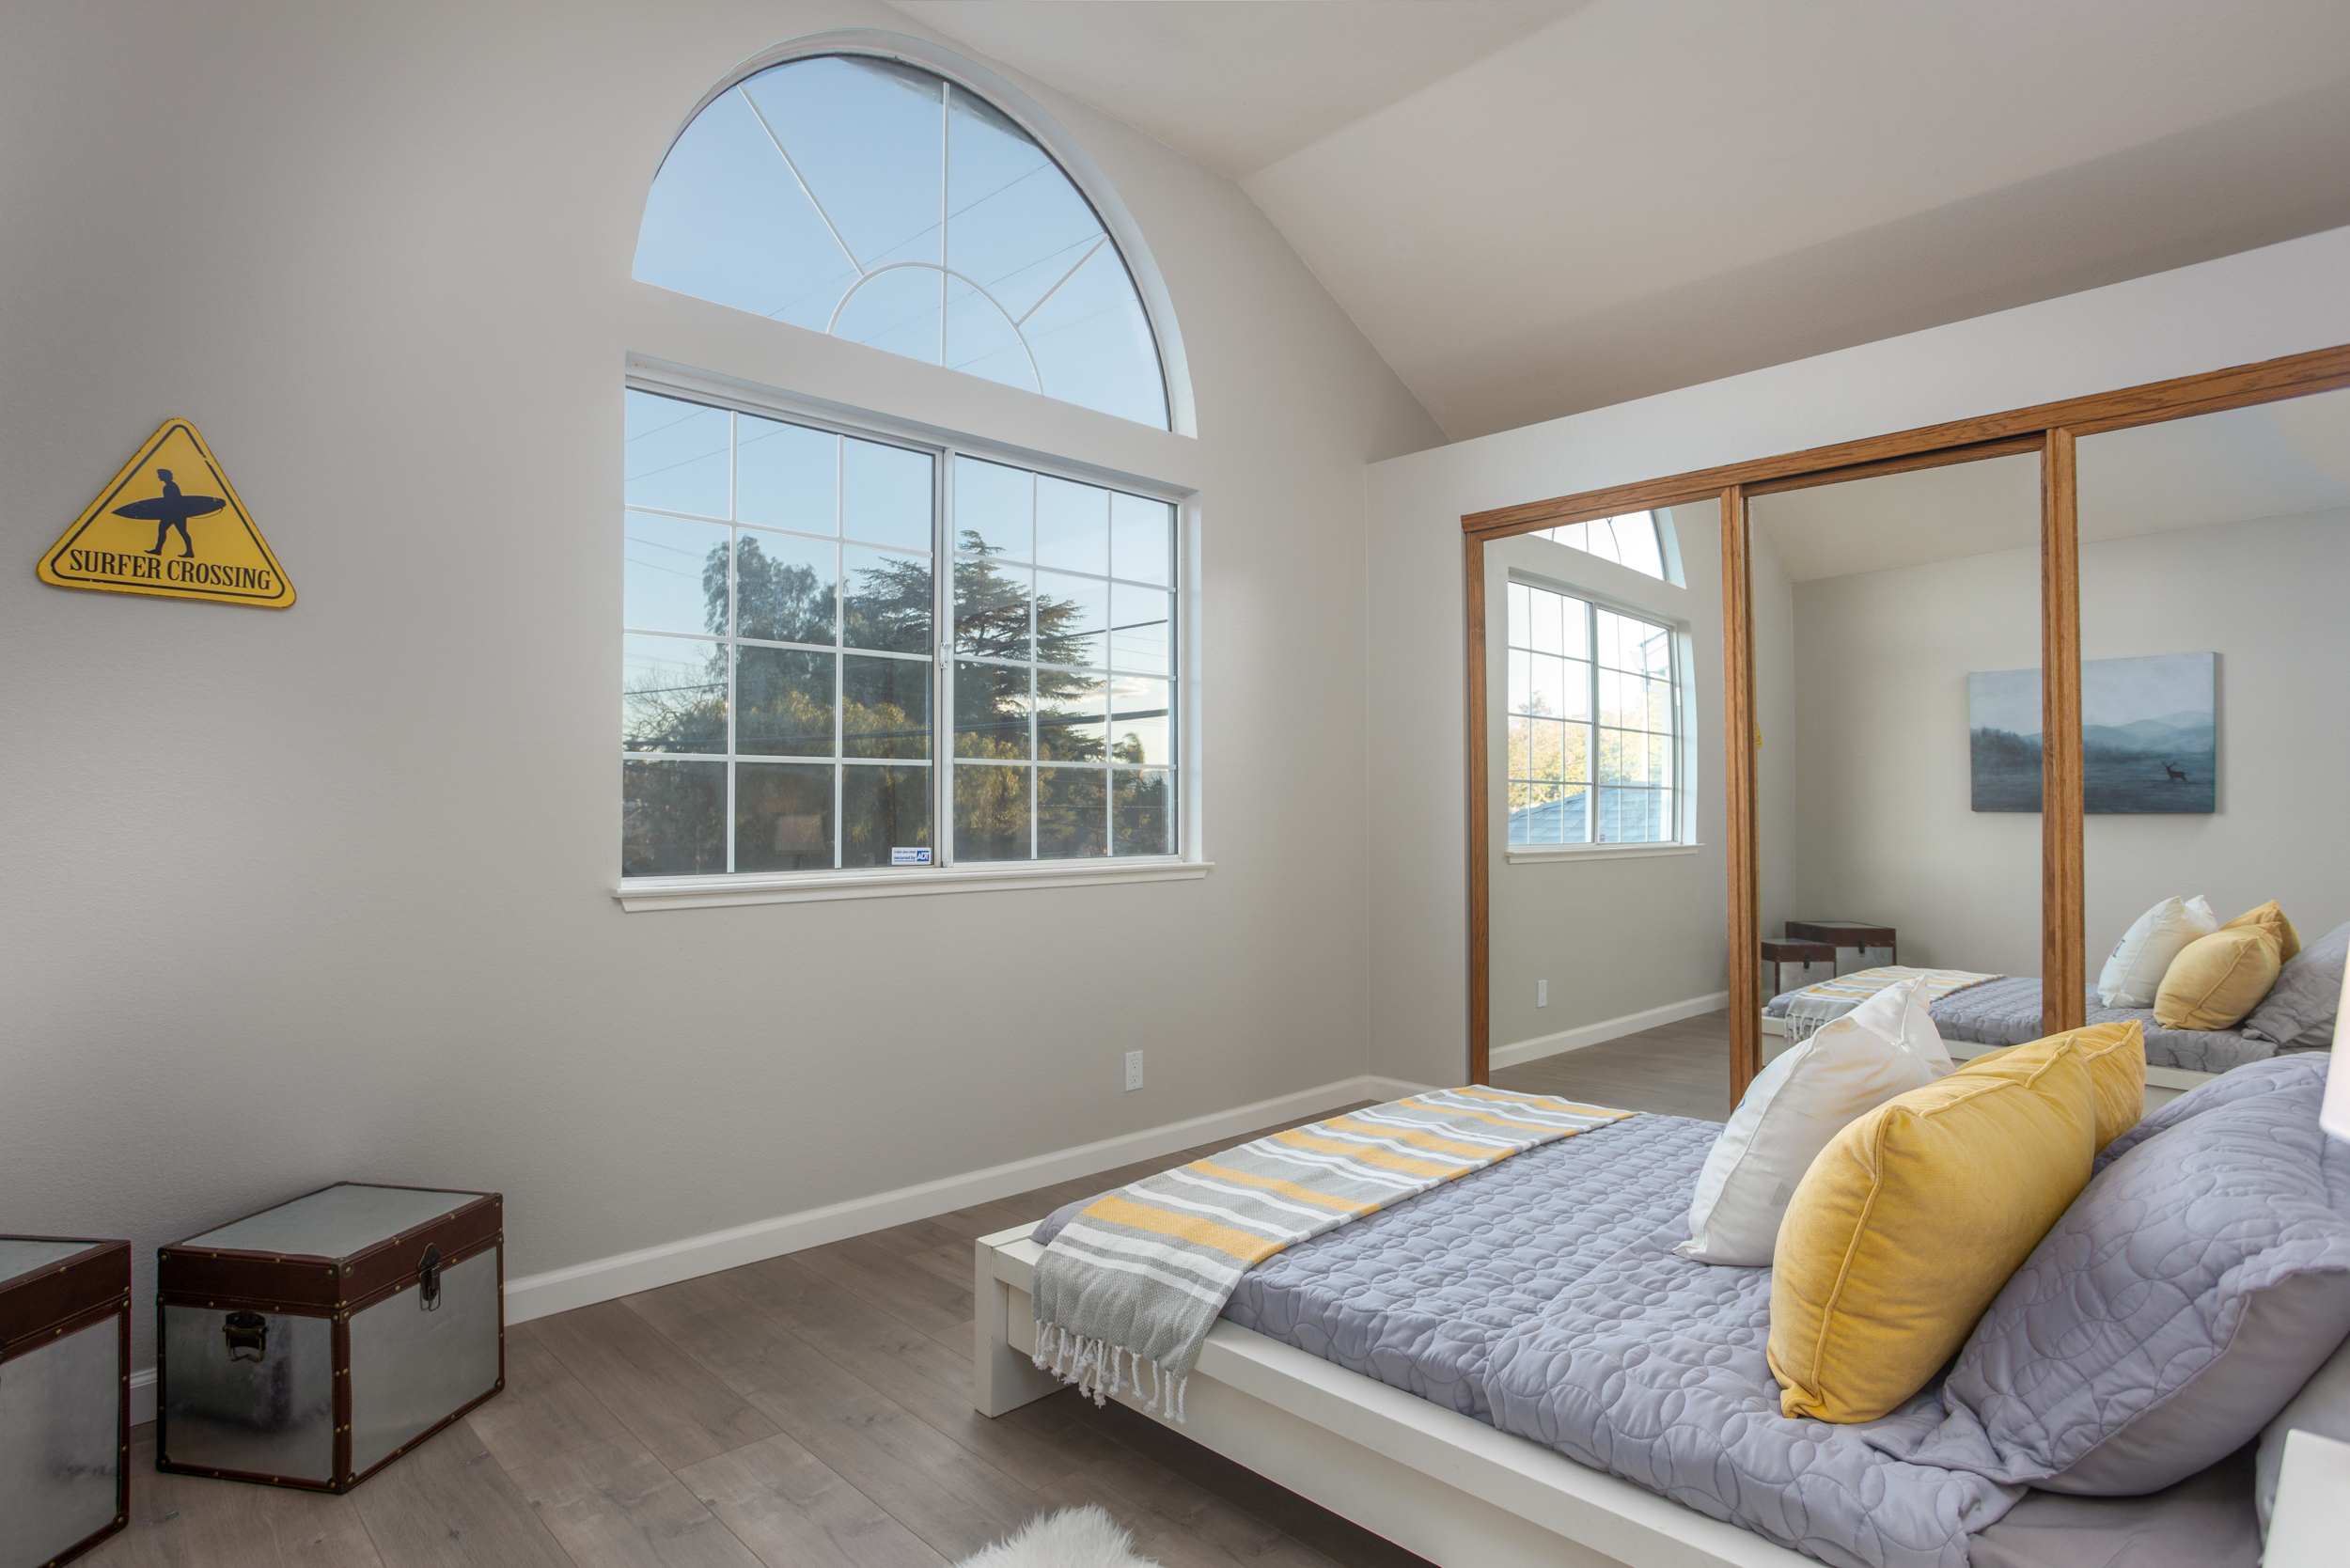 24 Bedroom.jpg